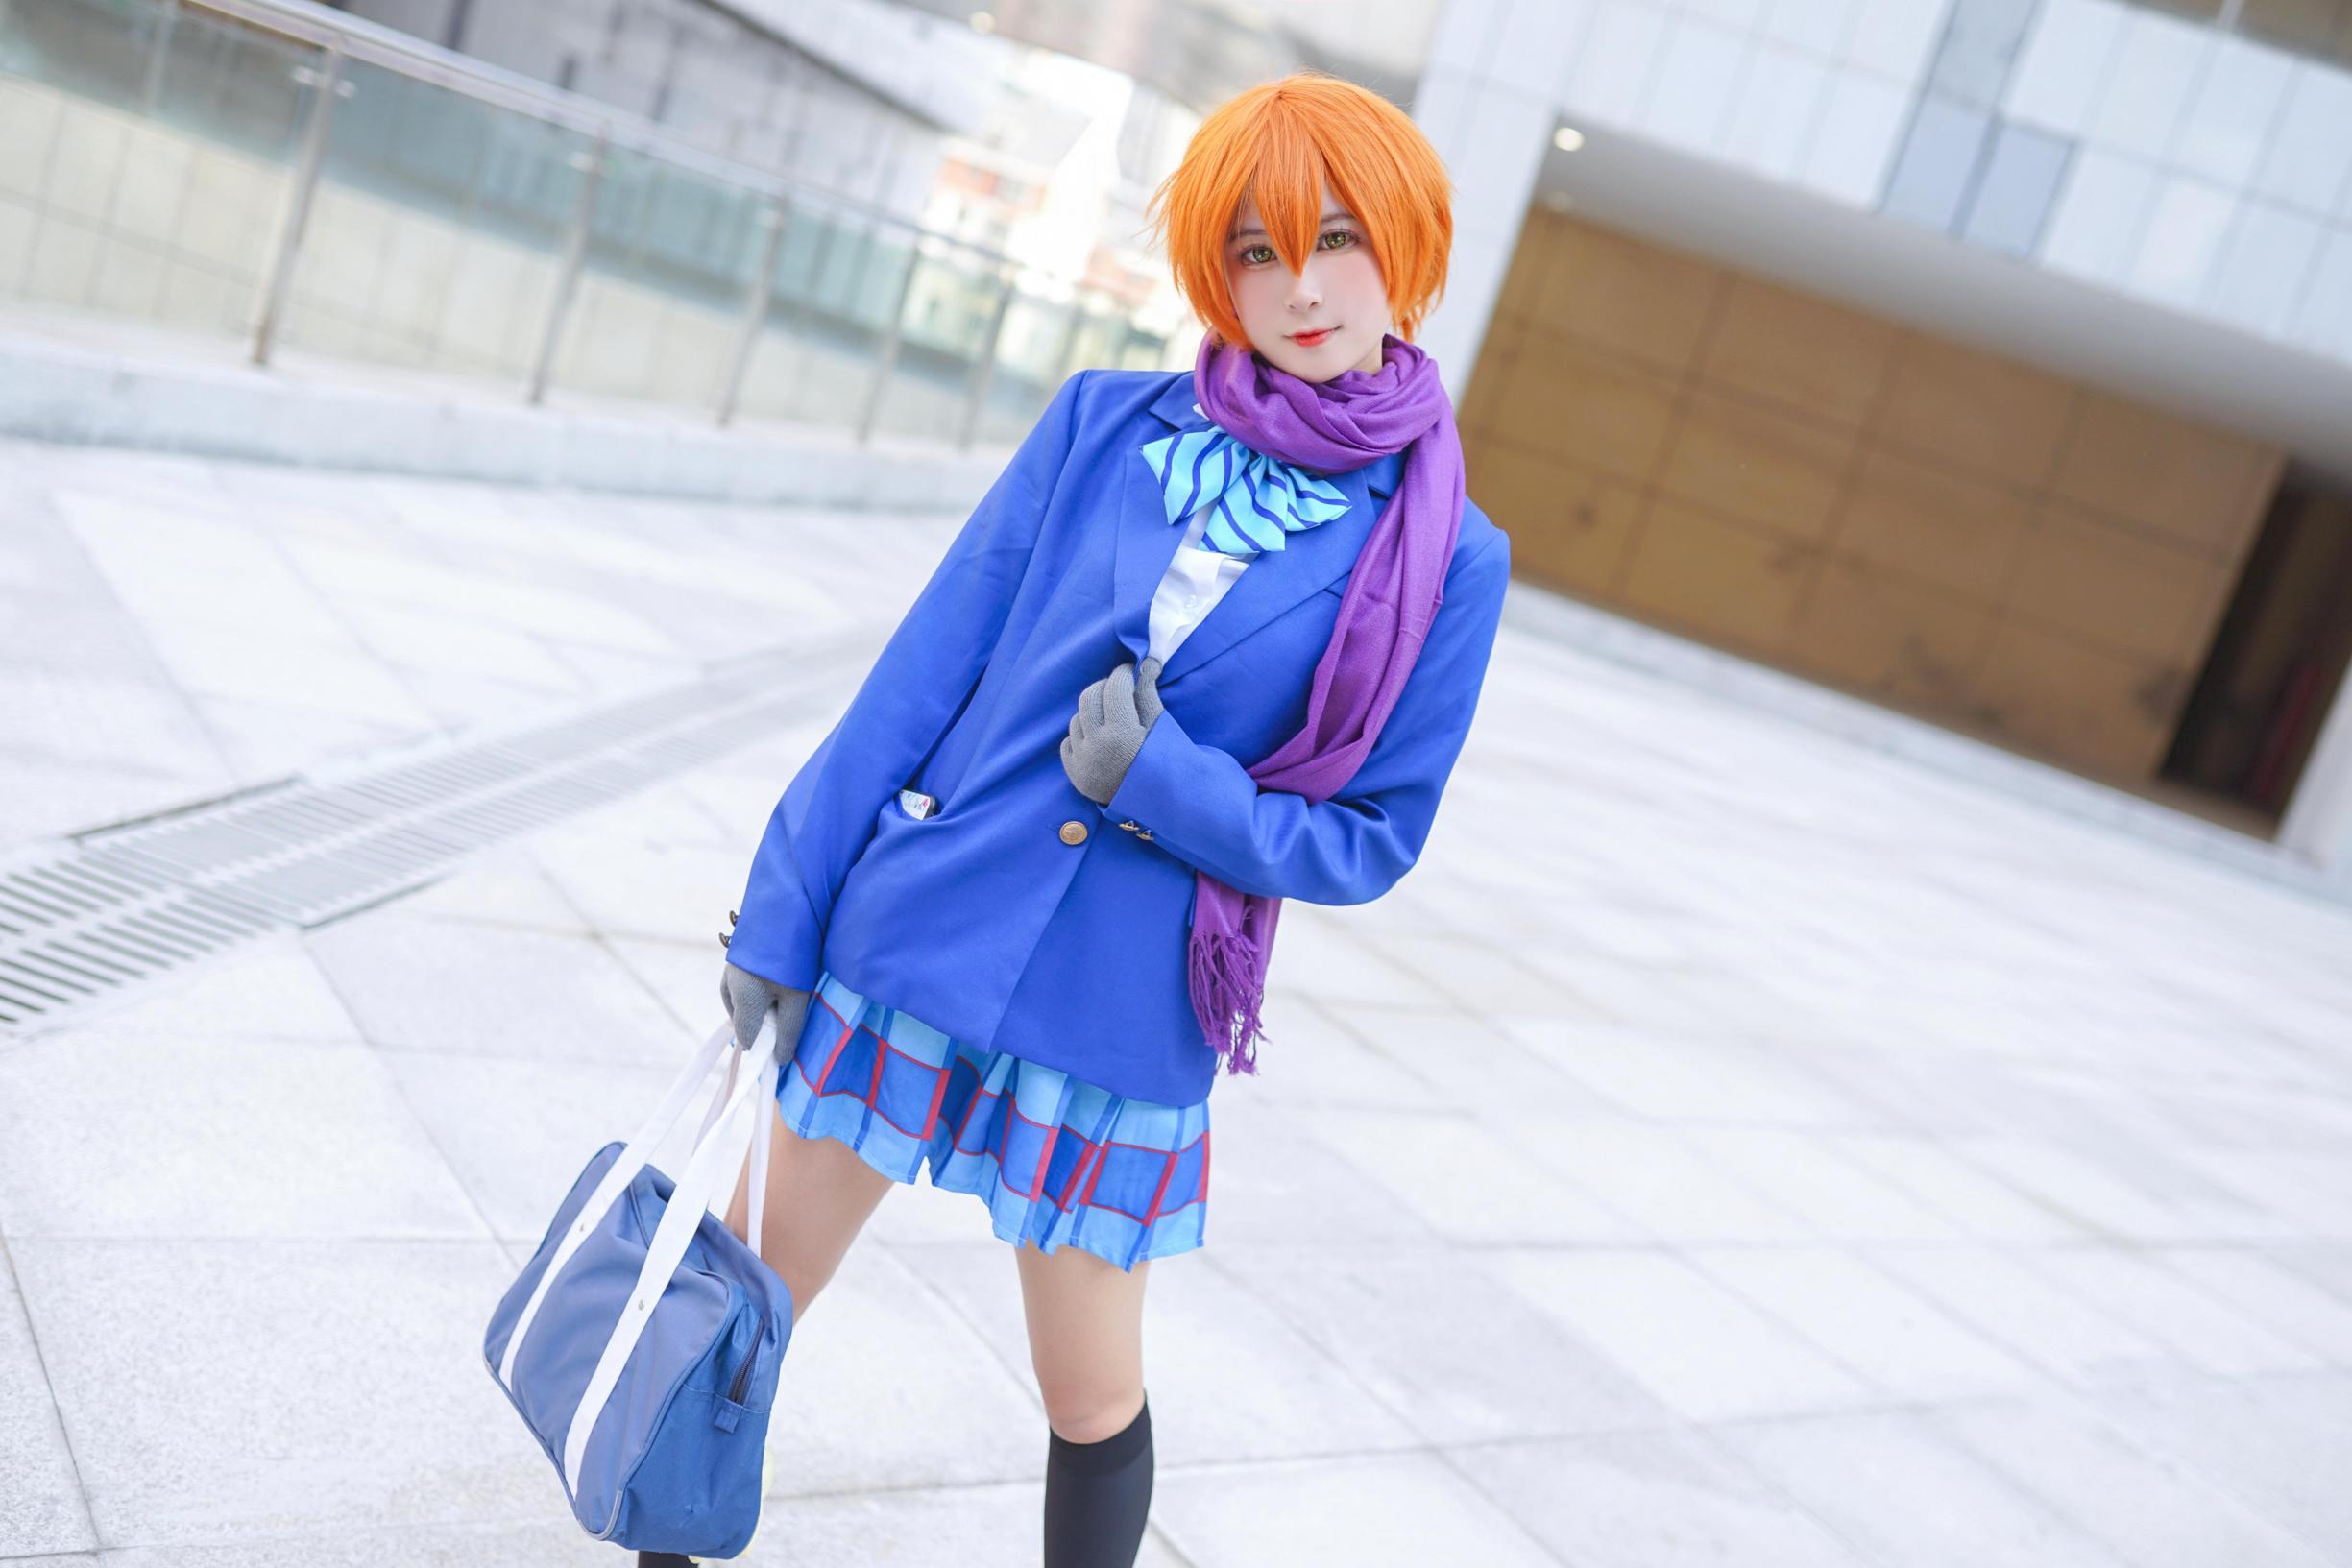 《LOVE LIVE!》美少女cosplay【CN:_李笑颜Lee】-第13张